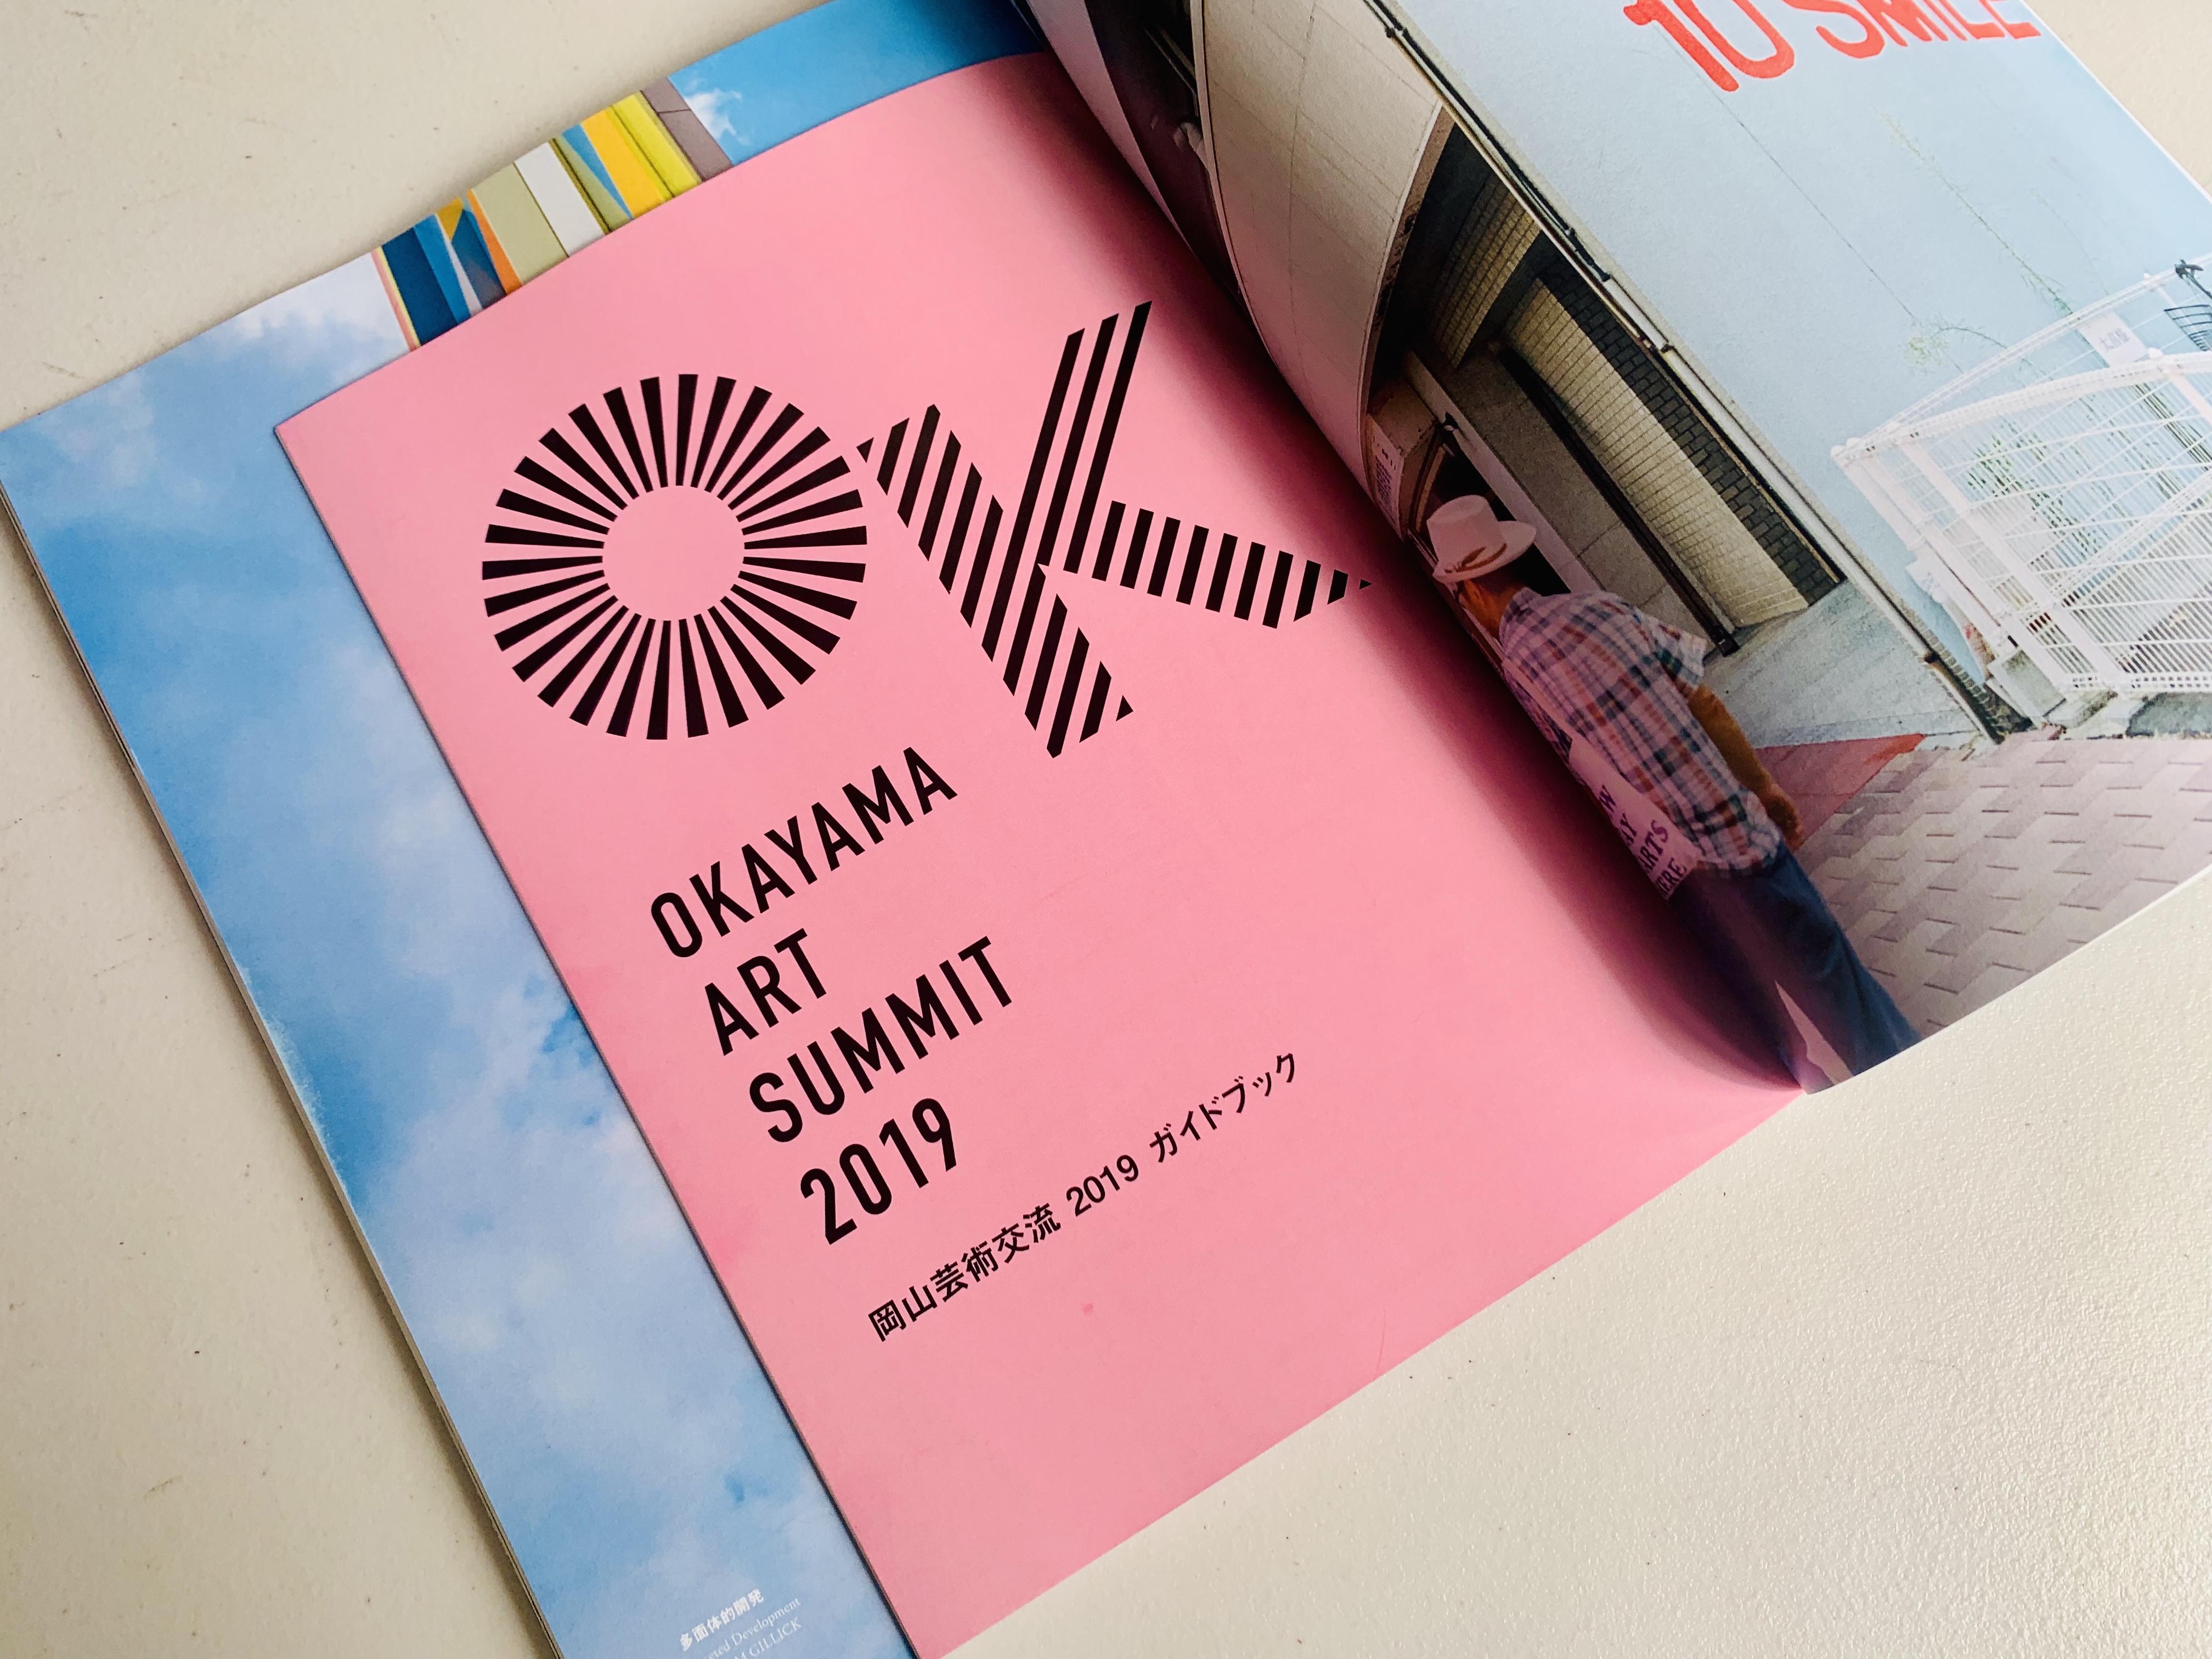 Casa BRUTUS特別編集『瀬戸内シティガイド』×岡山芸術交流2019ガイドブック発売中